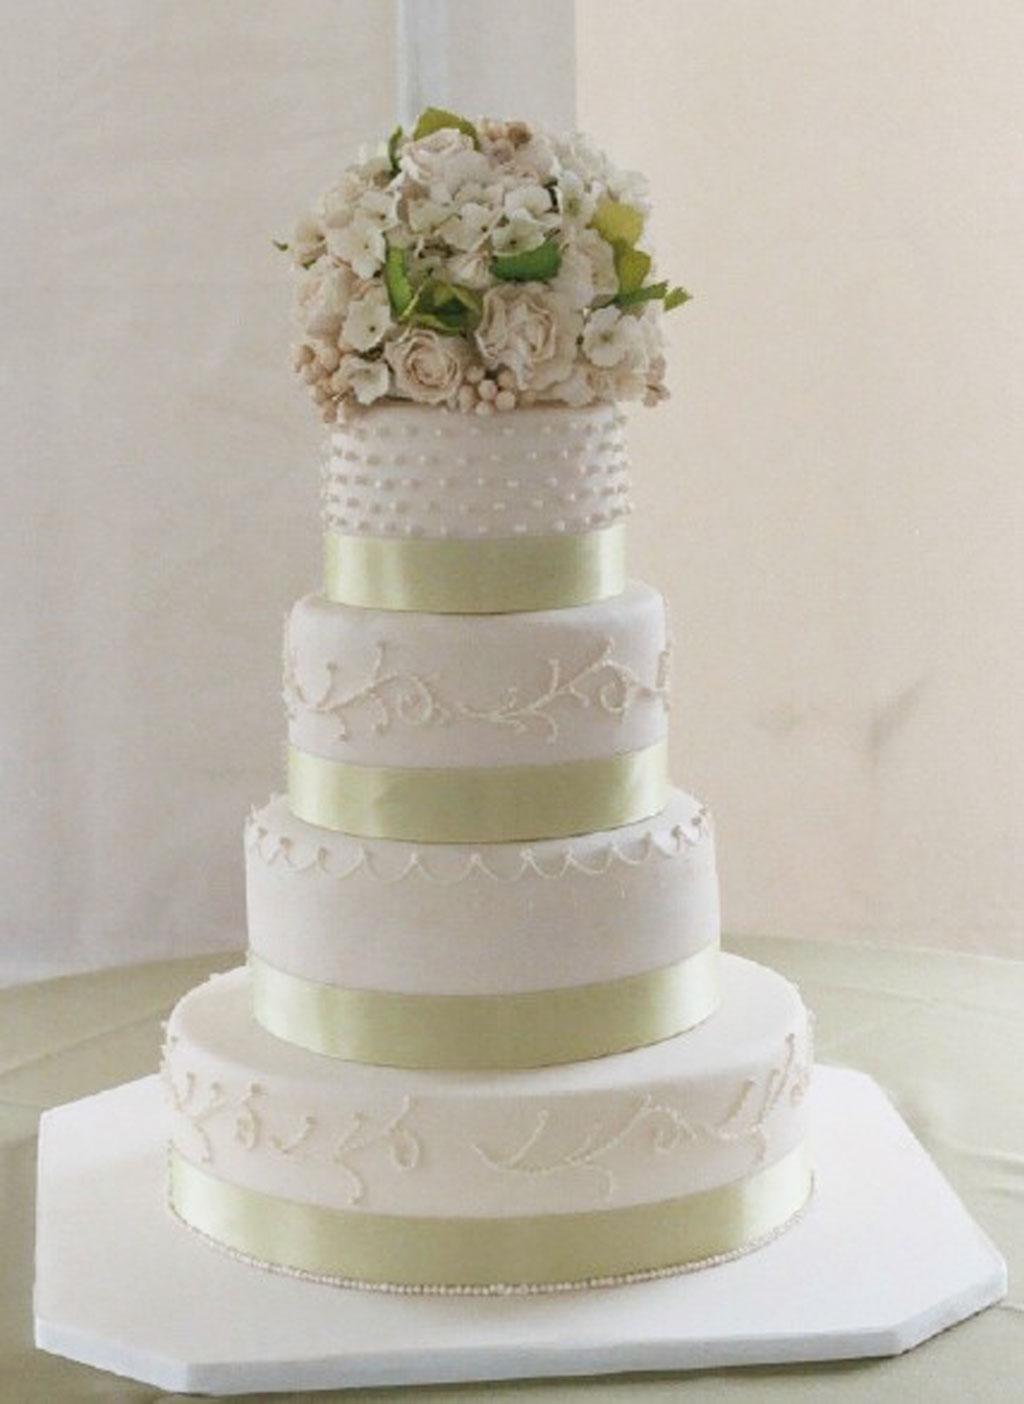 Super Moist White Wedding Cake Recipe Picture In Wedding Cake